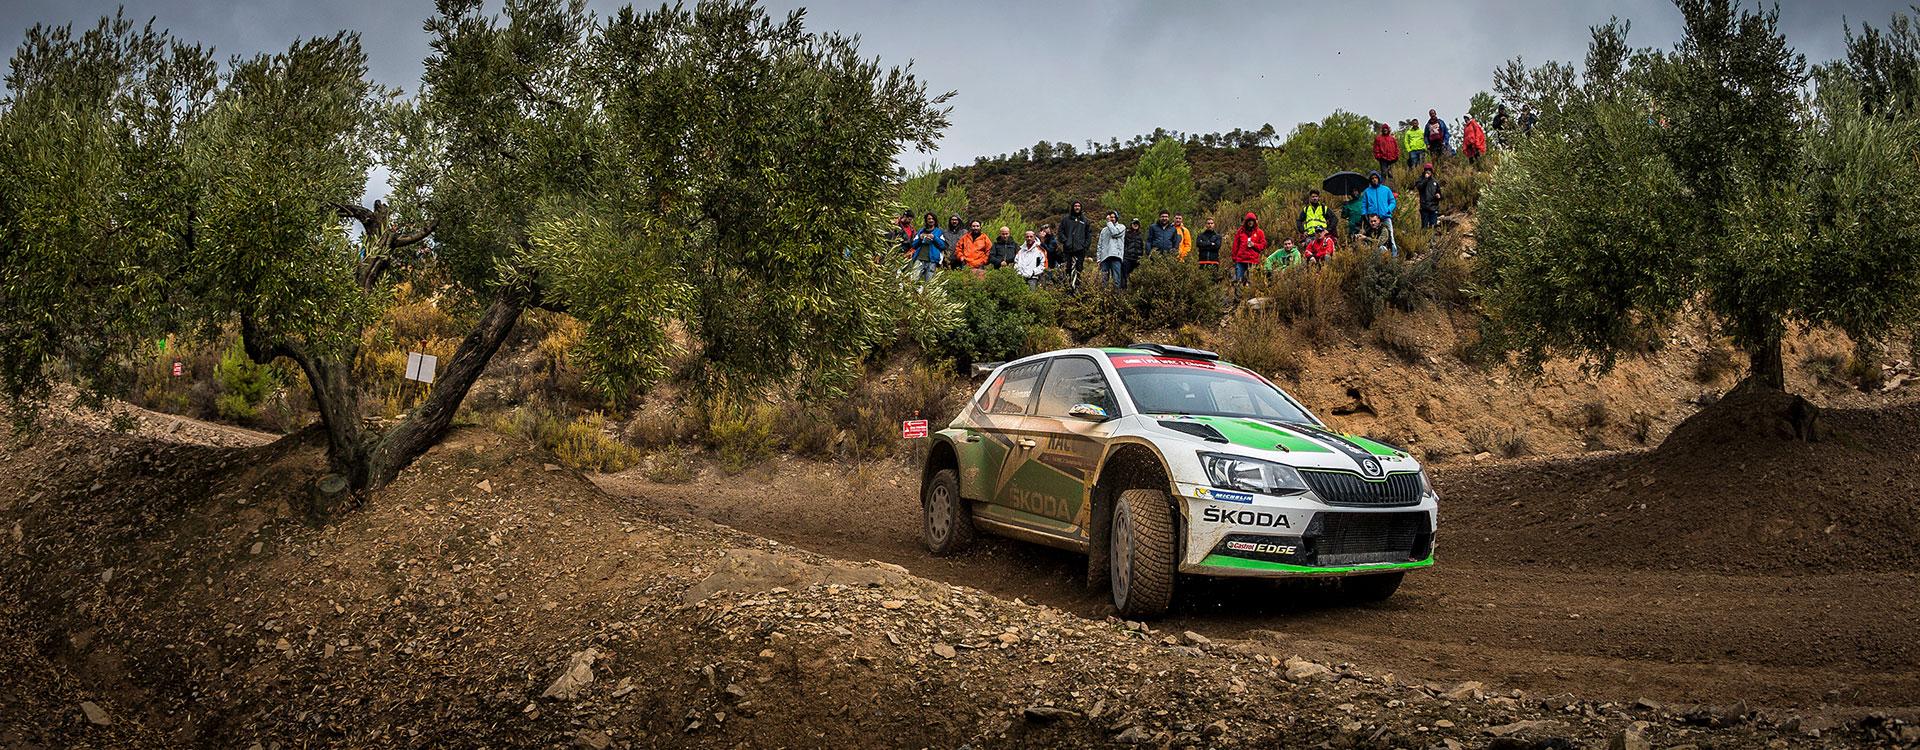 WRC Spain: Tidemand leads Kopecký after the Leg One